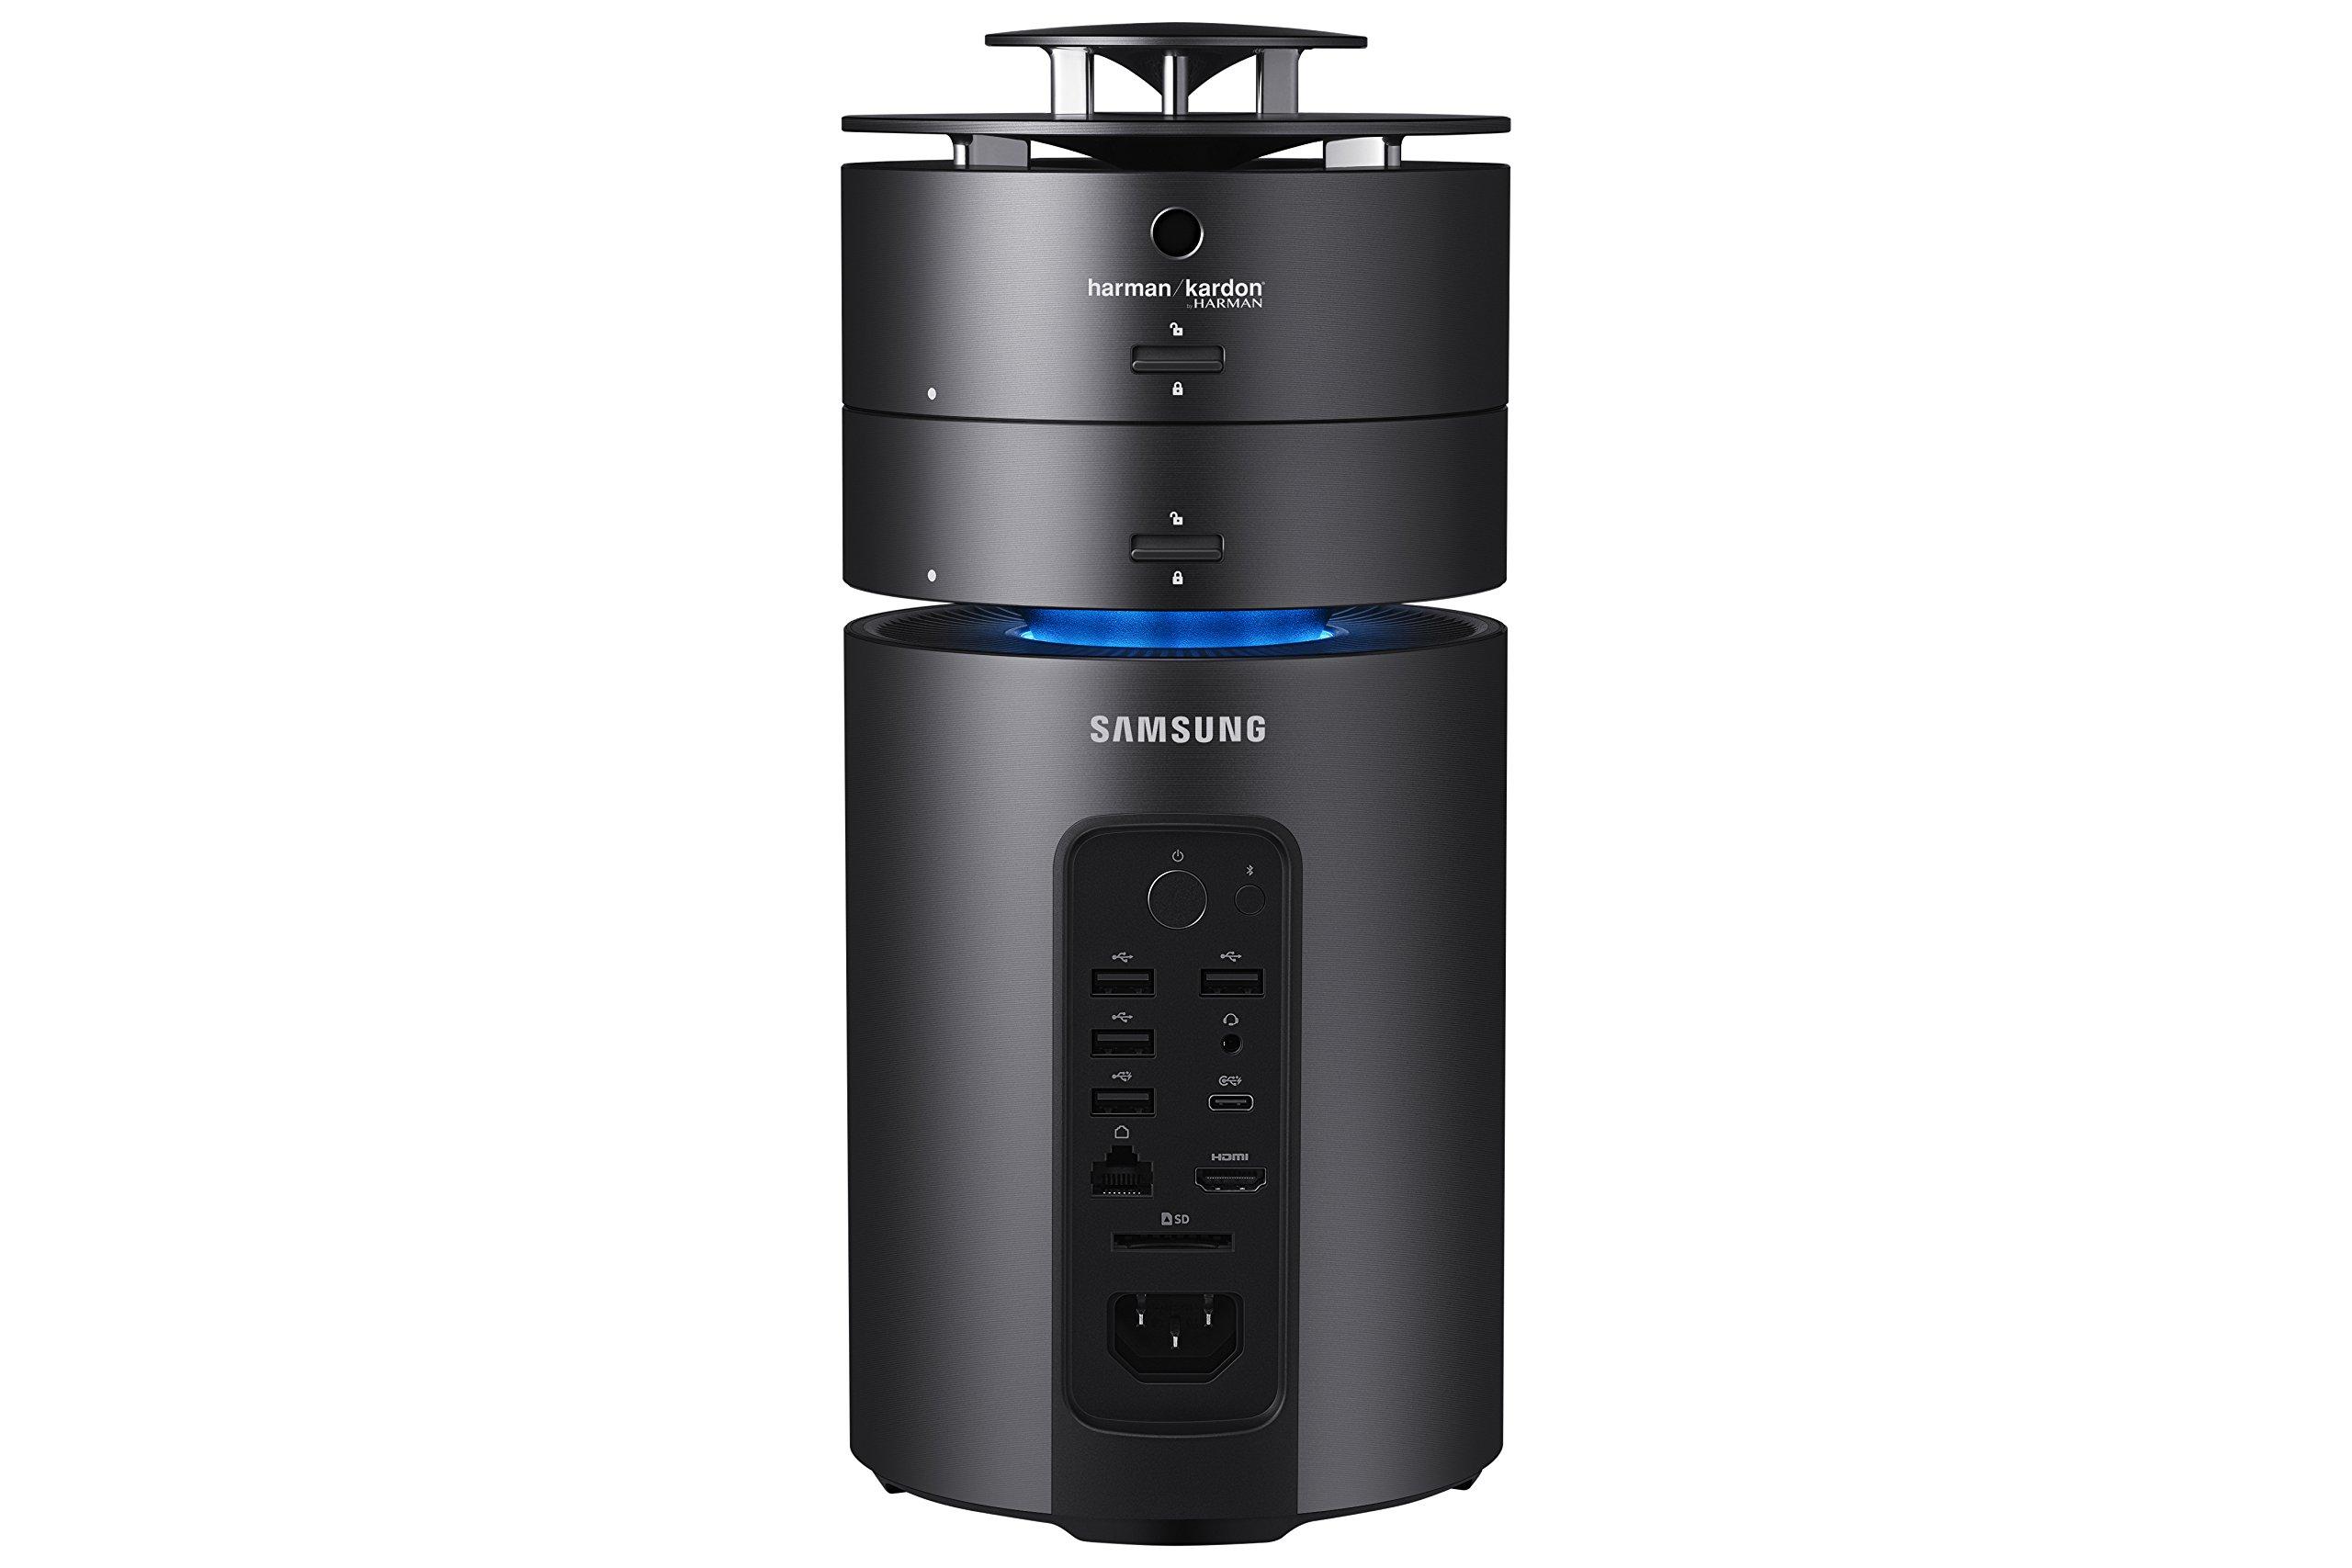 Samsung Electronics DP700C6A-A01US ArtPC Pulse Desktop, Intel i7 256GB SSD, 1TB HDD, Harman Kardon 360 Speaker, AMD Radeon RX 460